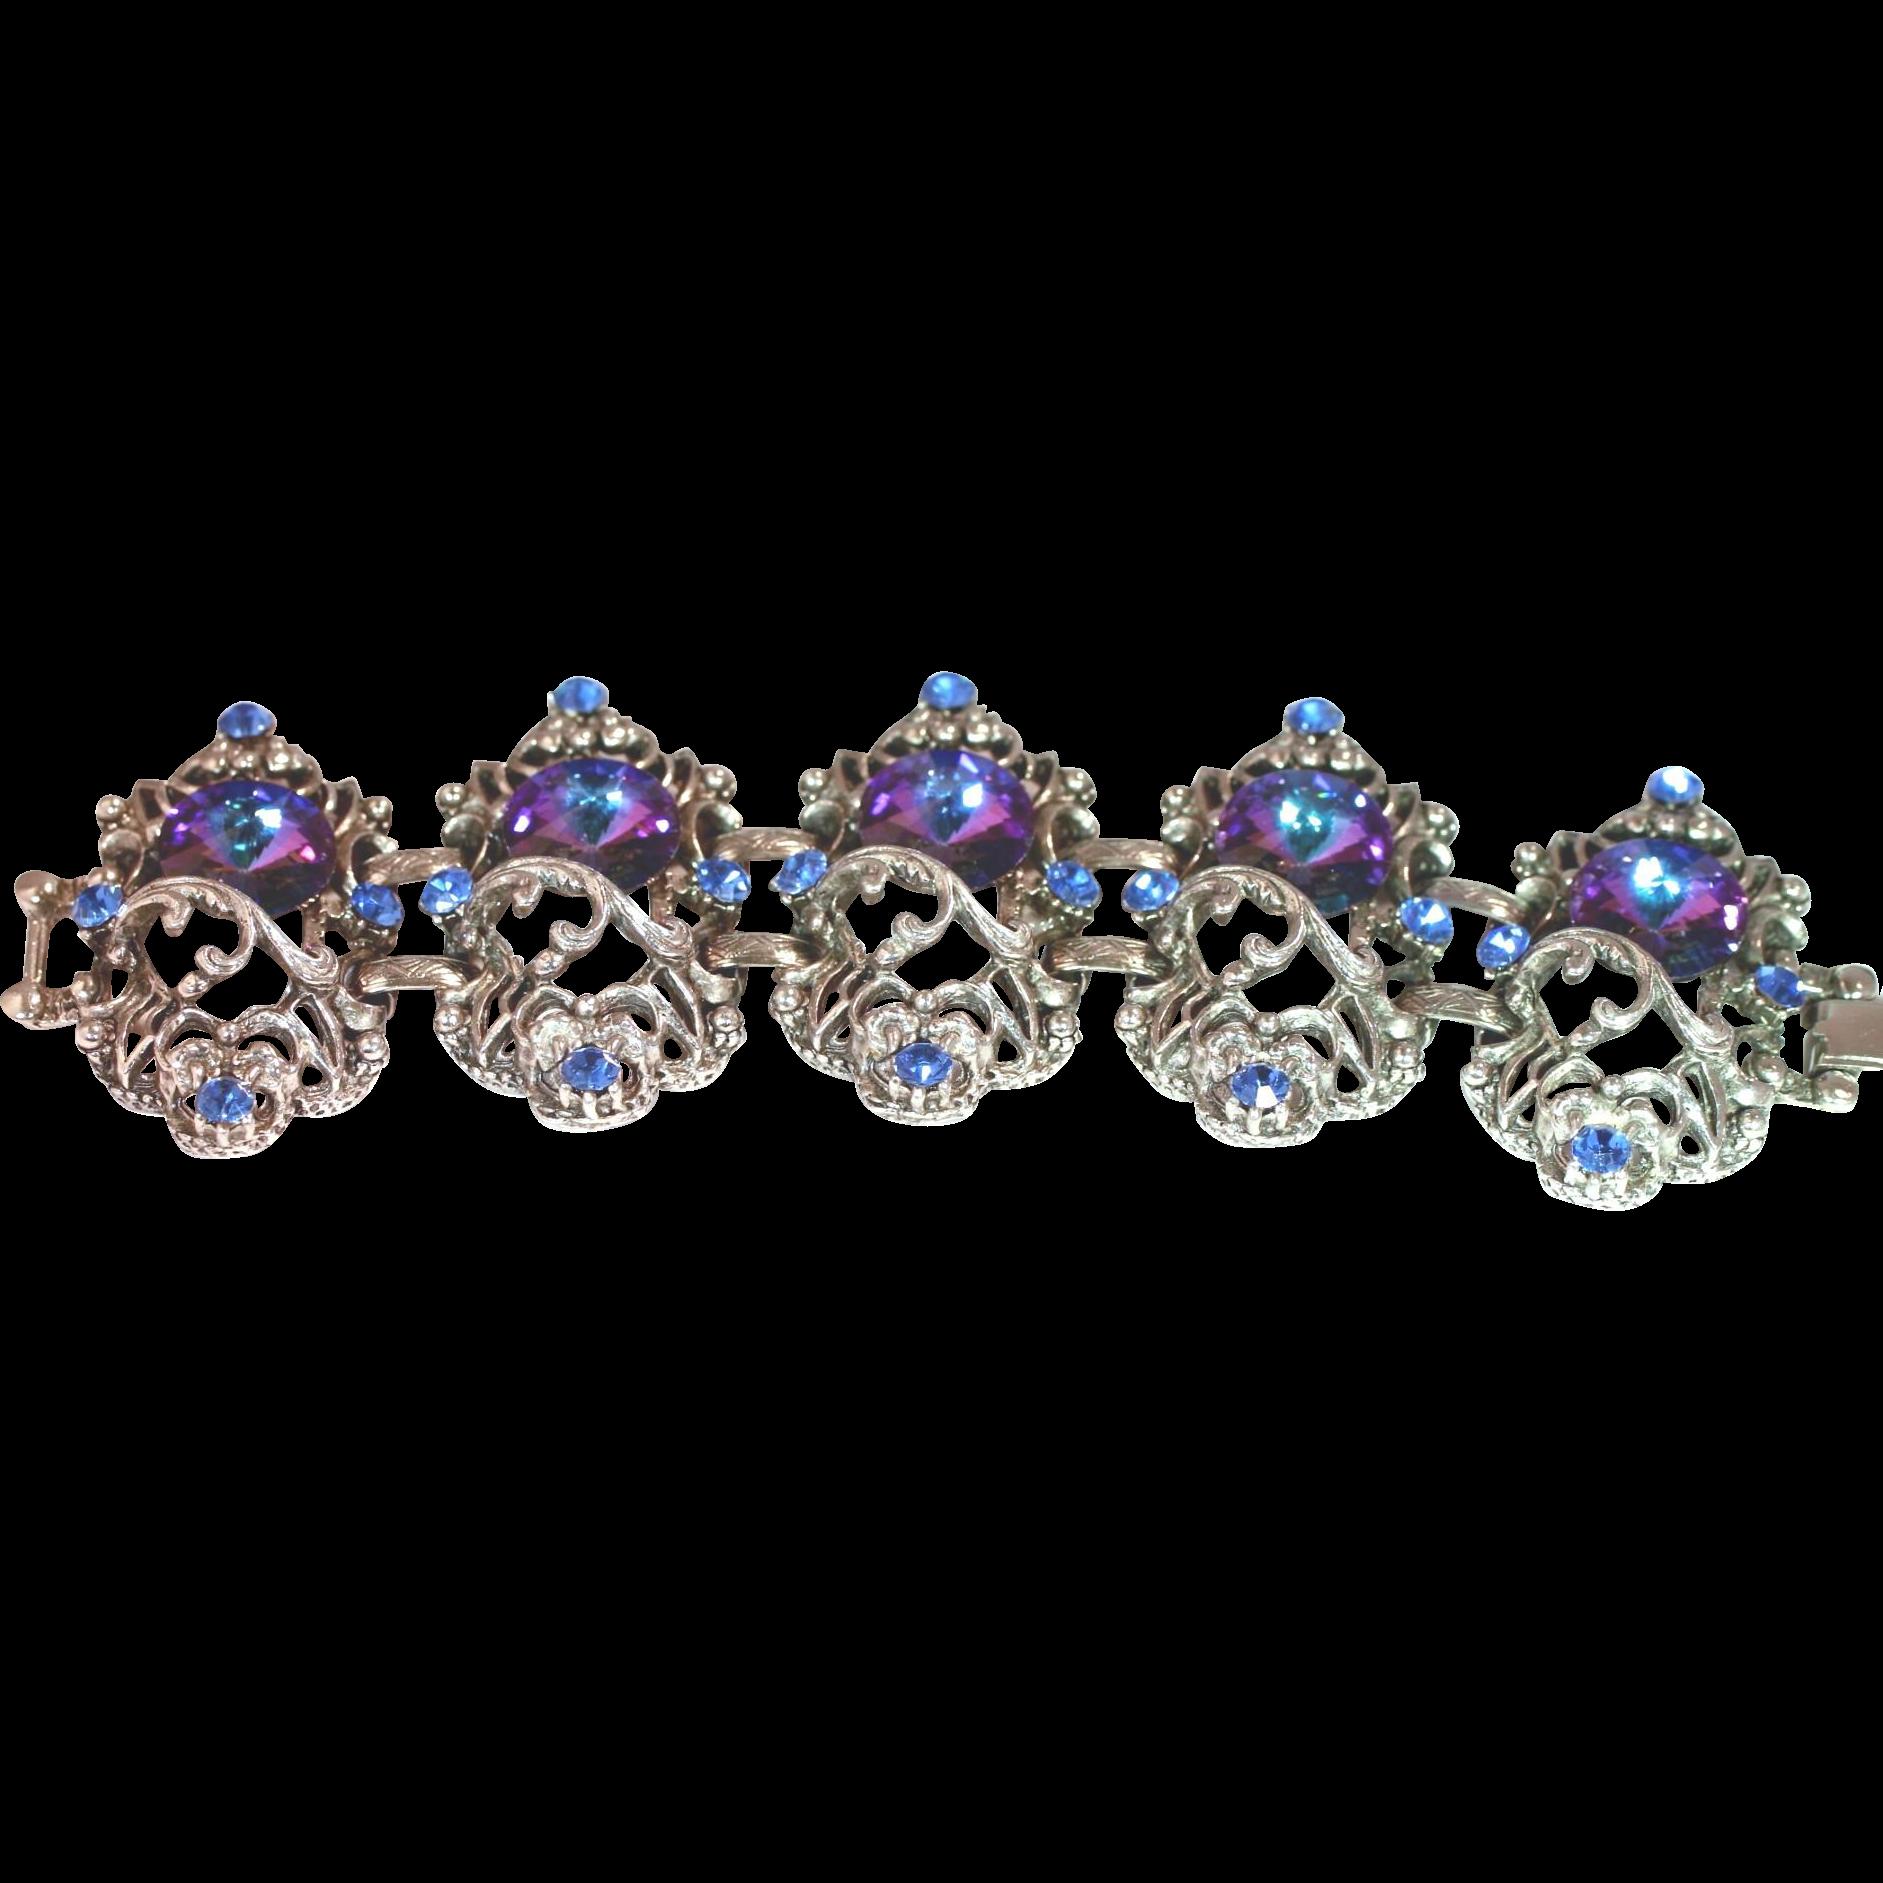 Vintage Purple & Blue Rivoli Chunky Bracelet - Nice!!